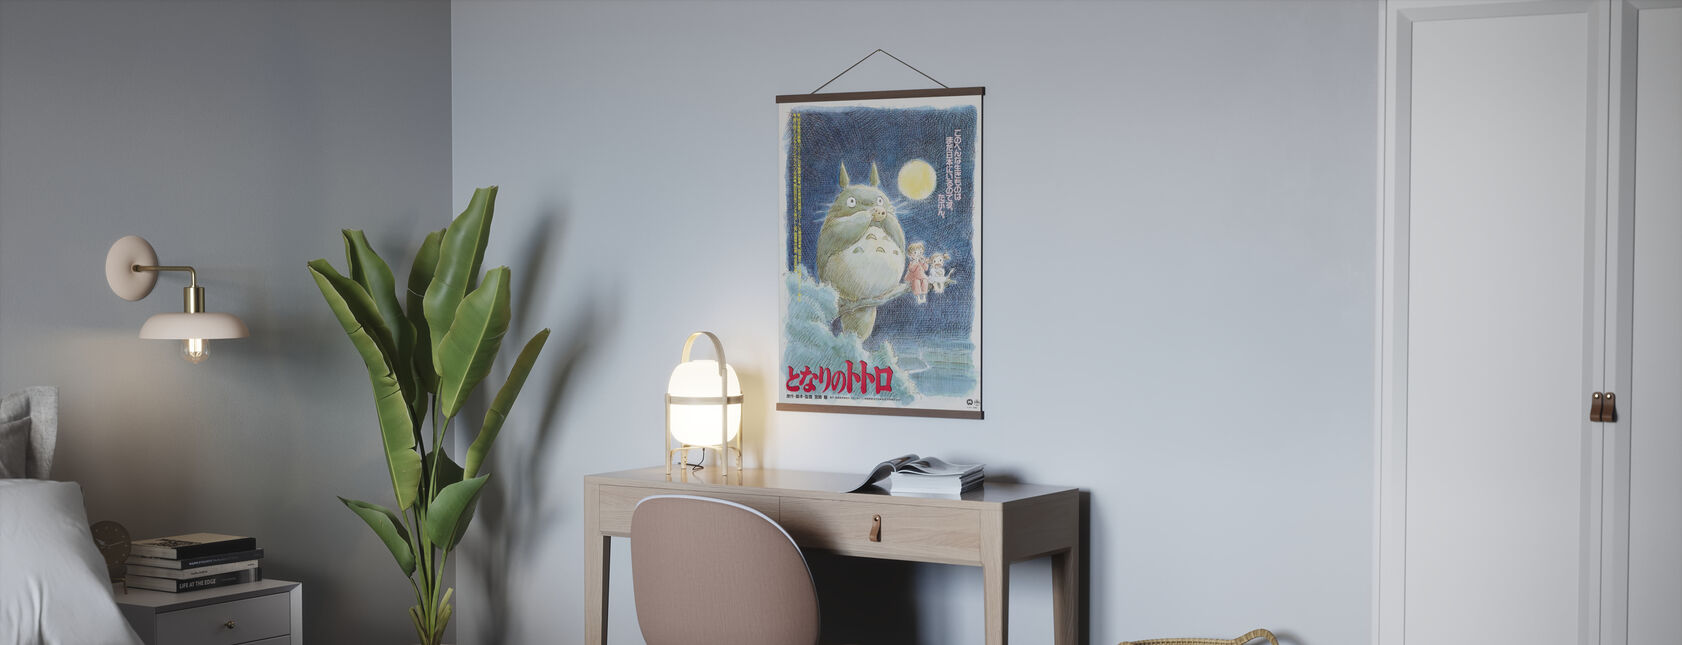 Min granne Totoro - Poster - Kontor